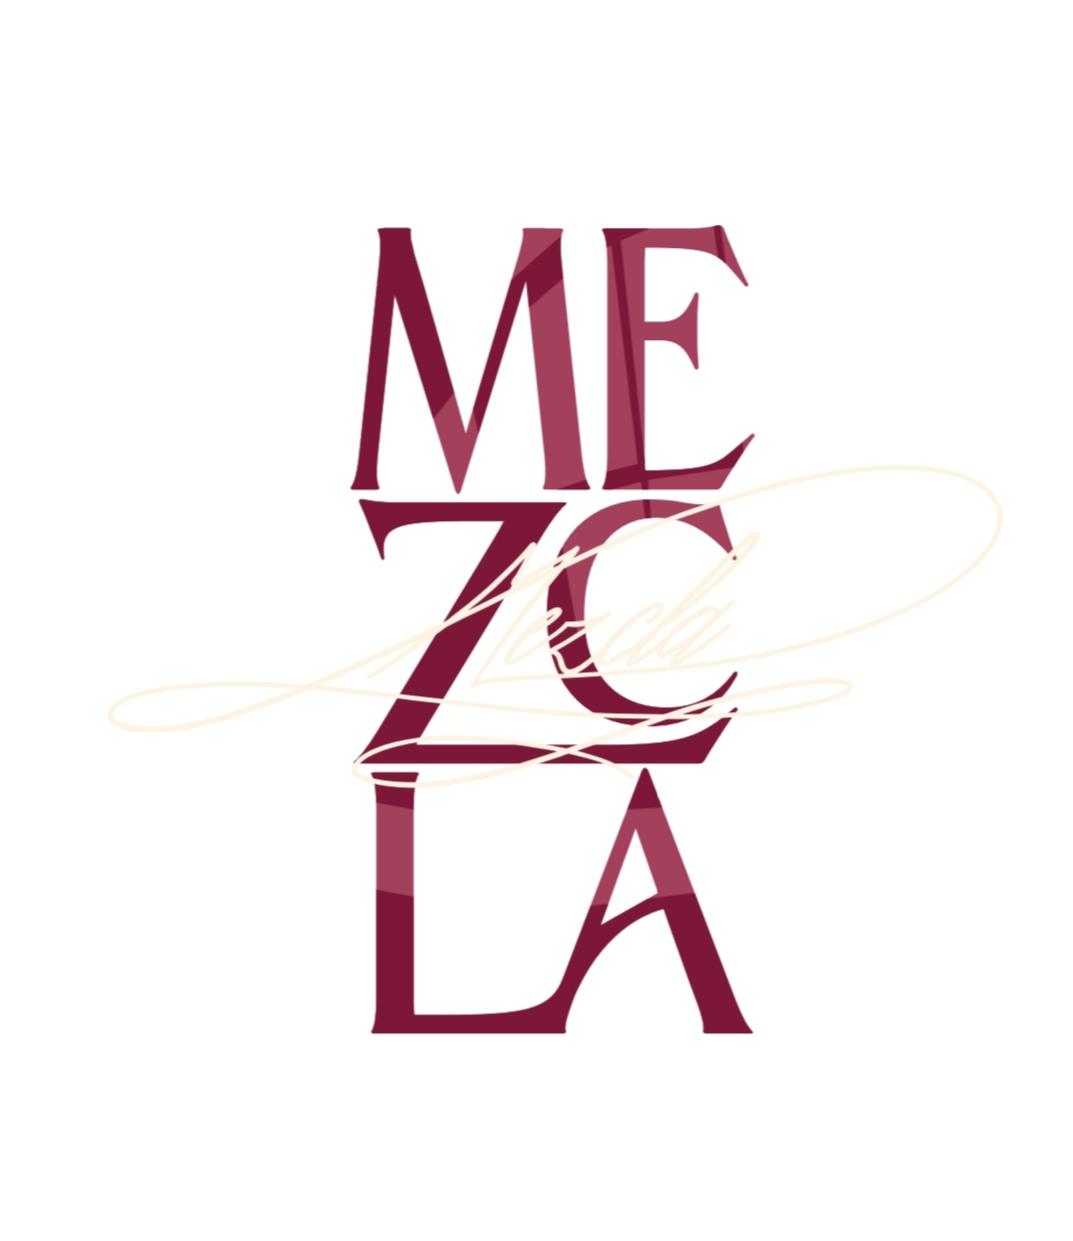 Mezscla